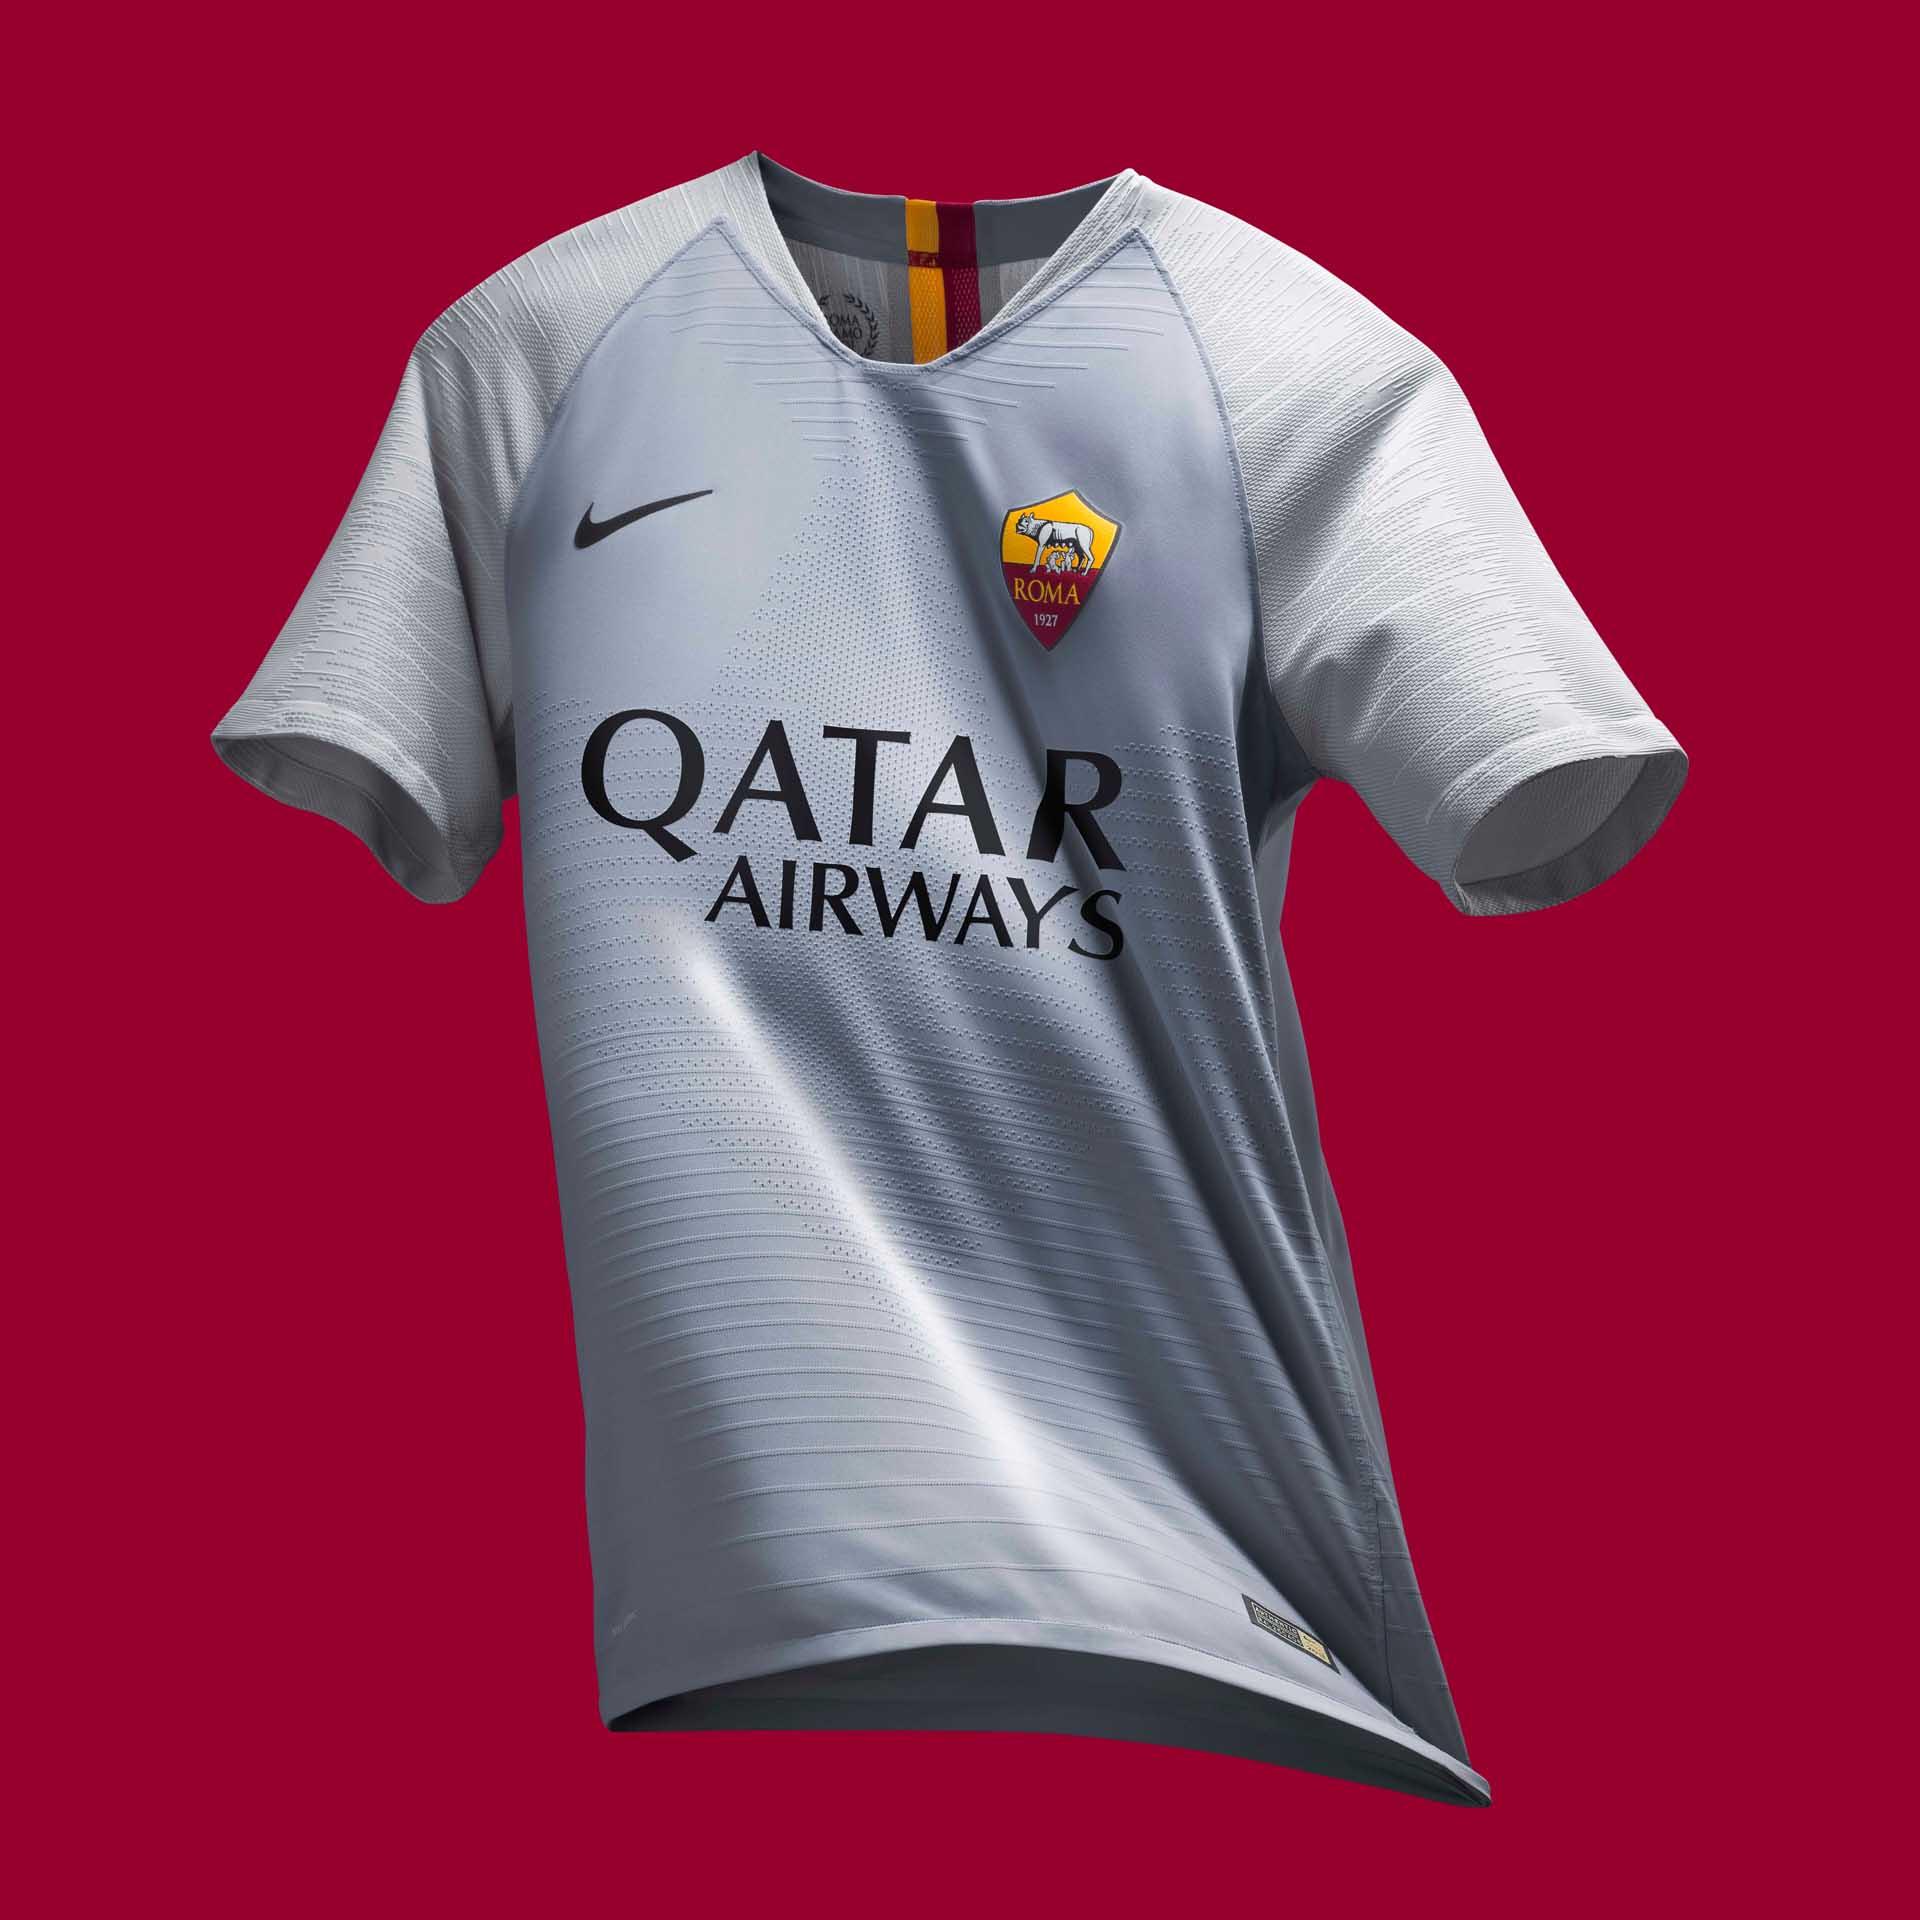 1a6e0ca26d5 Nike Launch Roma 2018 19 Away Shirt - SoccerBible